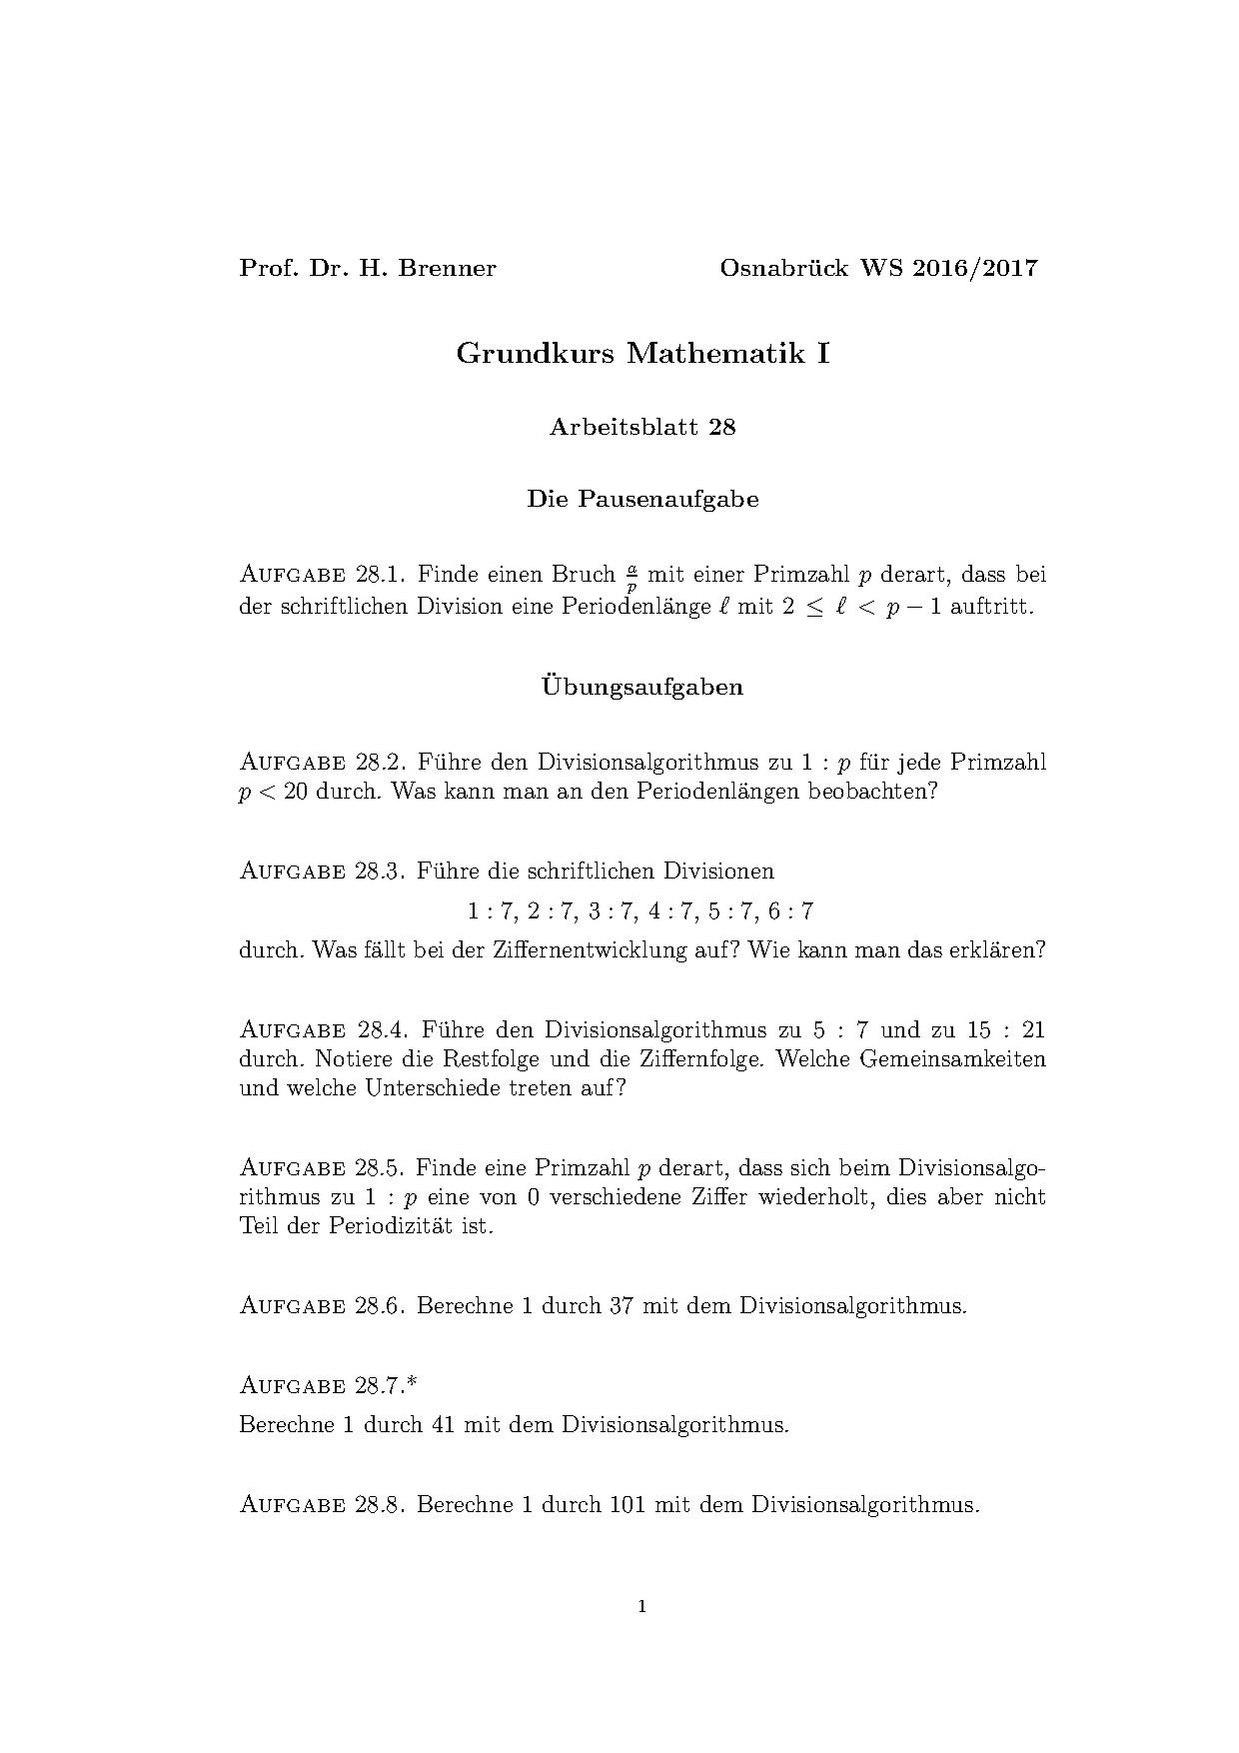 Berühmt Primzahlen 1 100 Arbeitsblatt Galerie - Mathe Arbeitsblatt ...